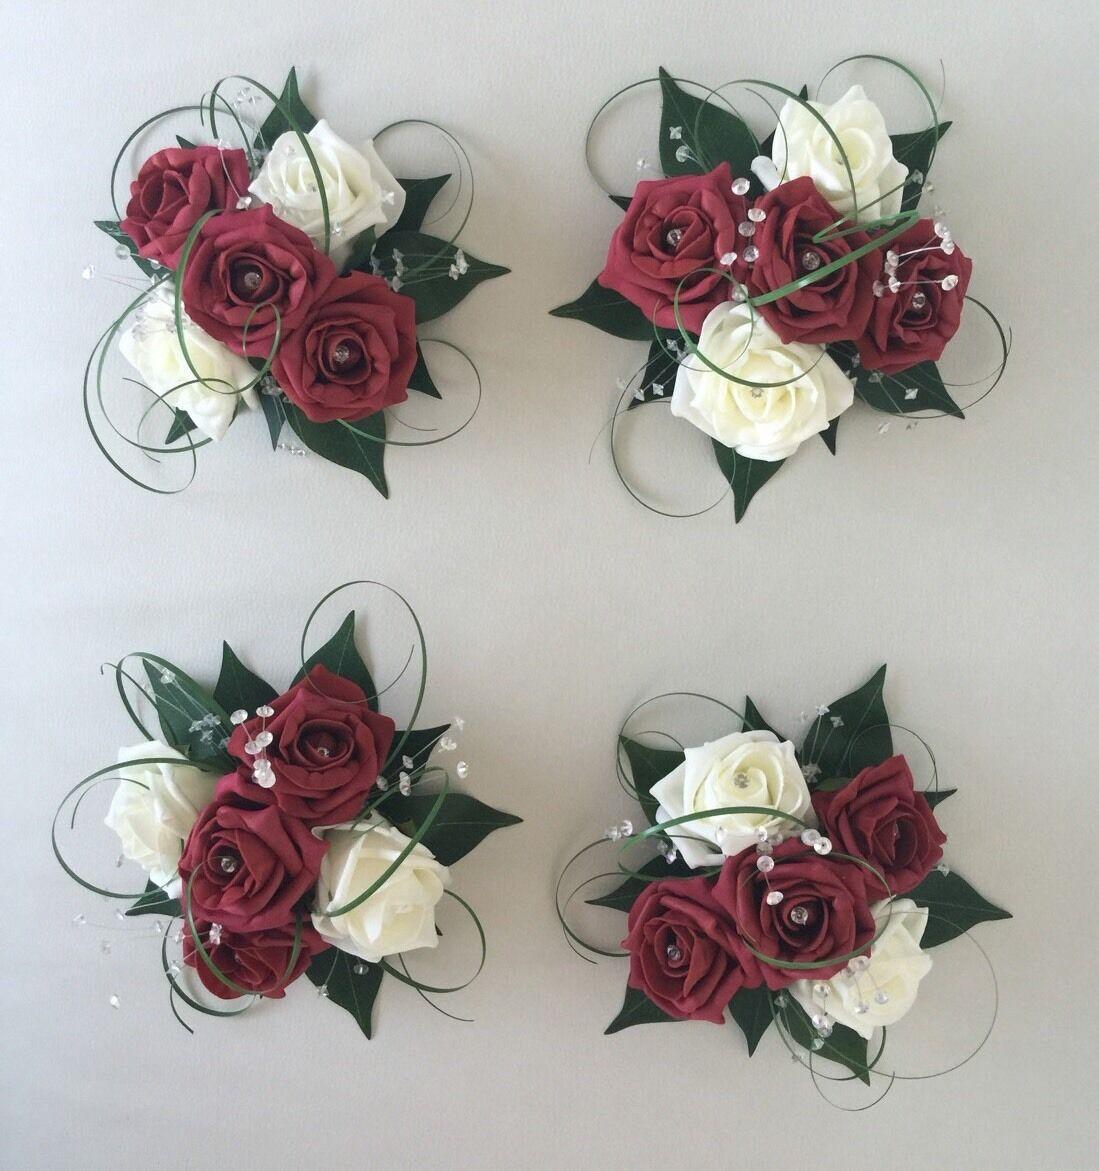 4 X FLOWERS BURGUNDY IVORY WEDDING CAKE TOPPER TABLE DECORATION BOWL CENTREPIECE